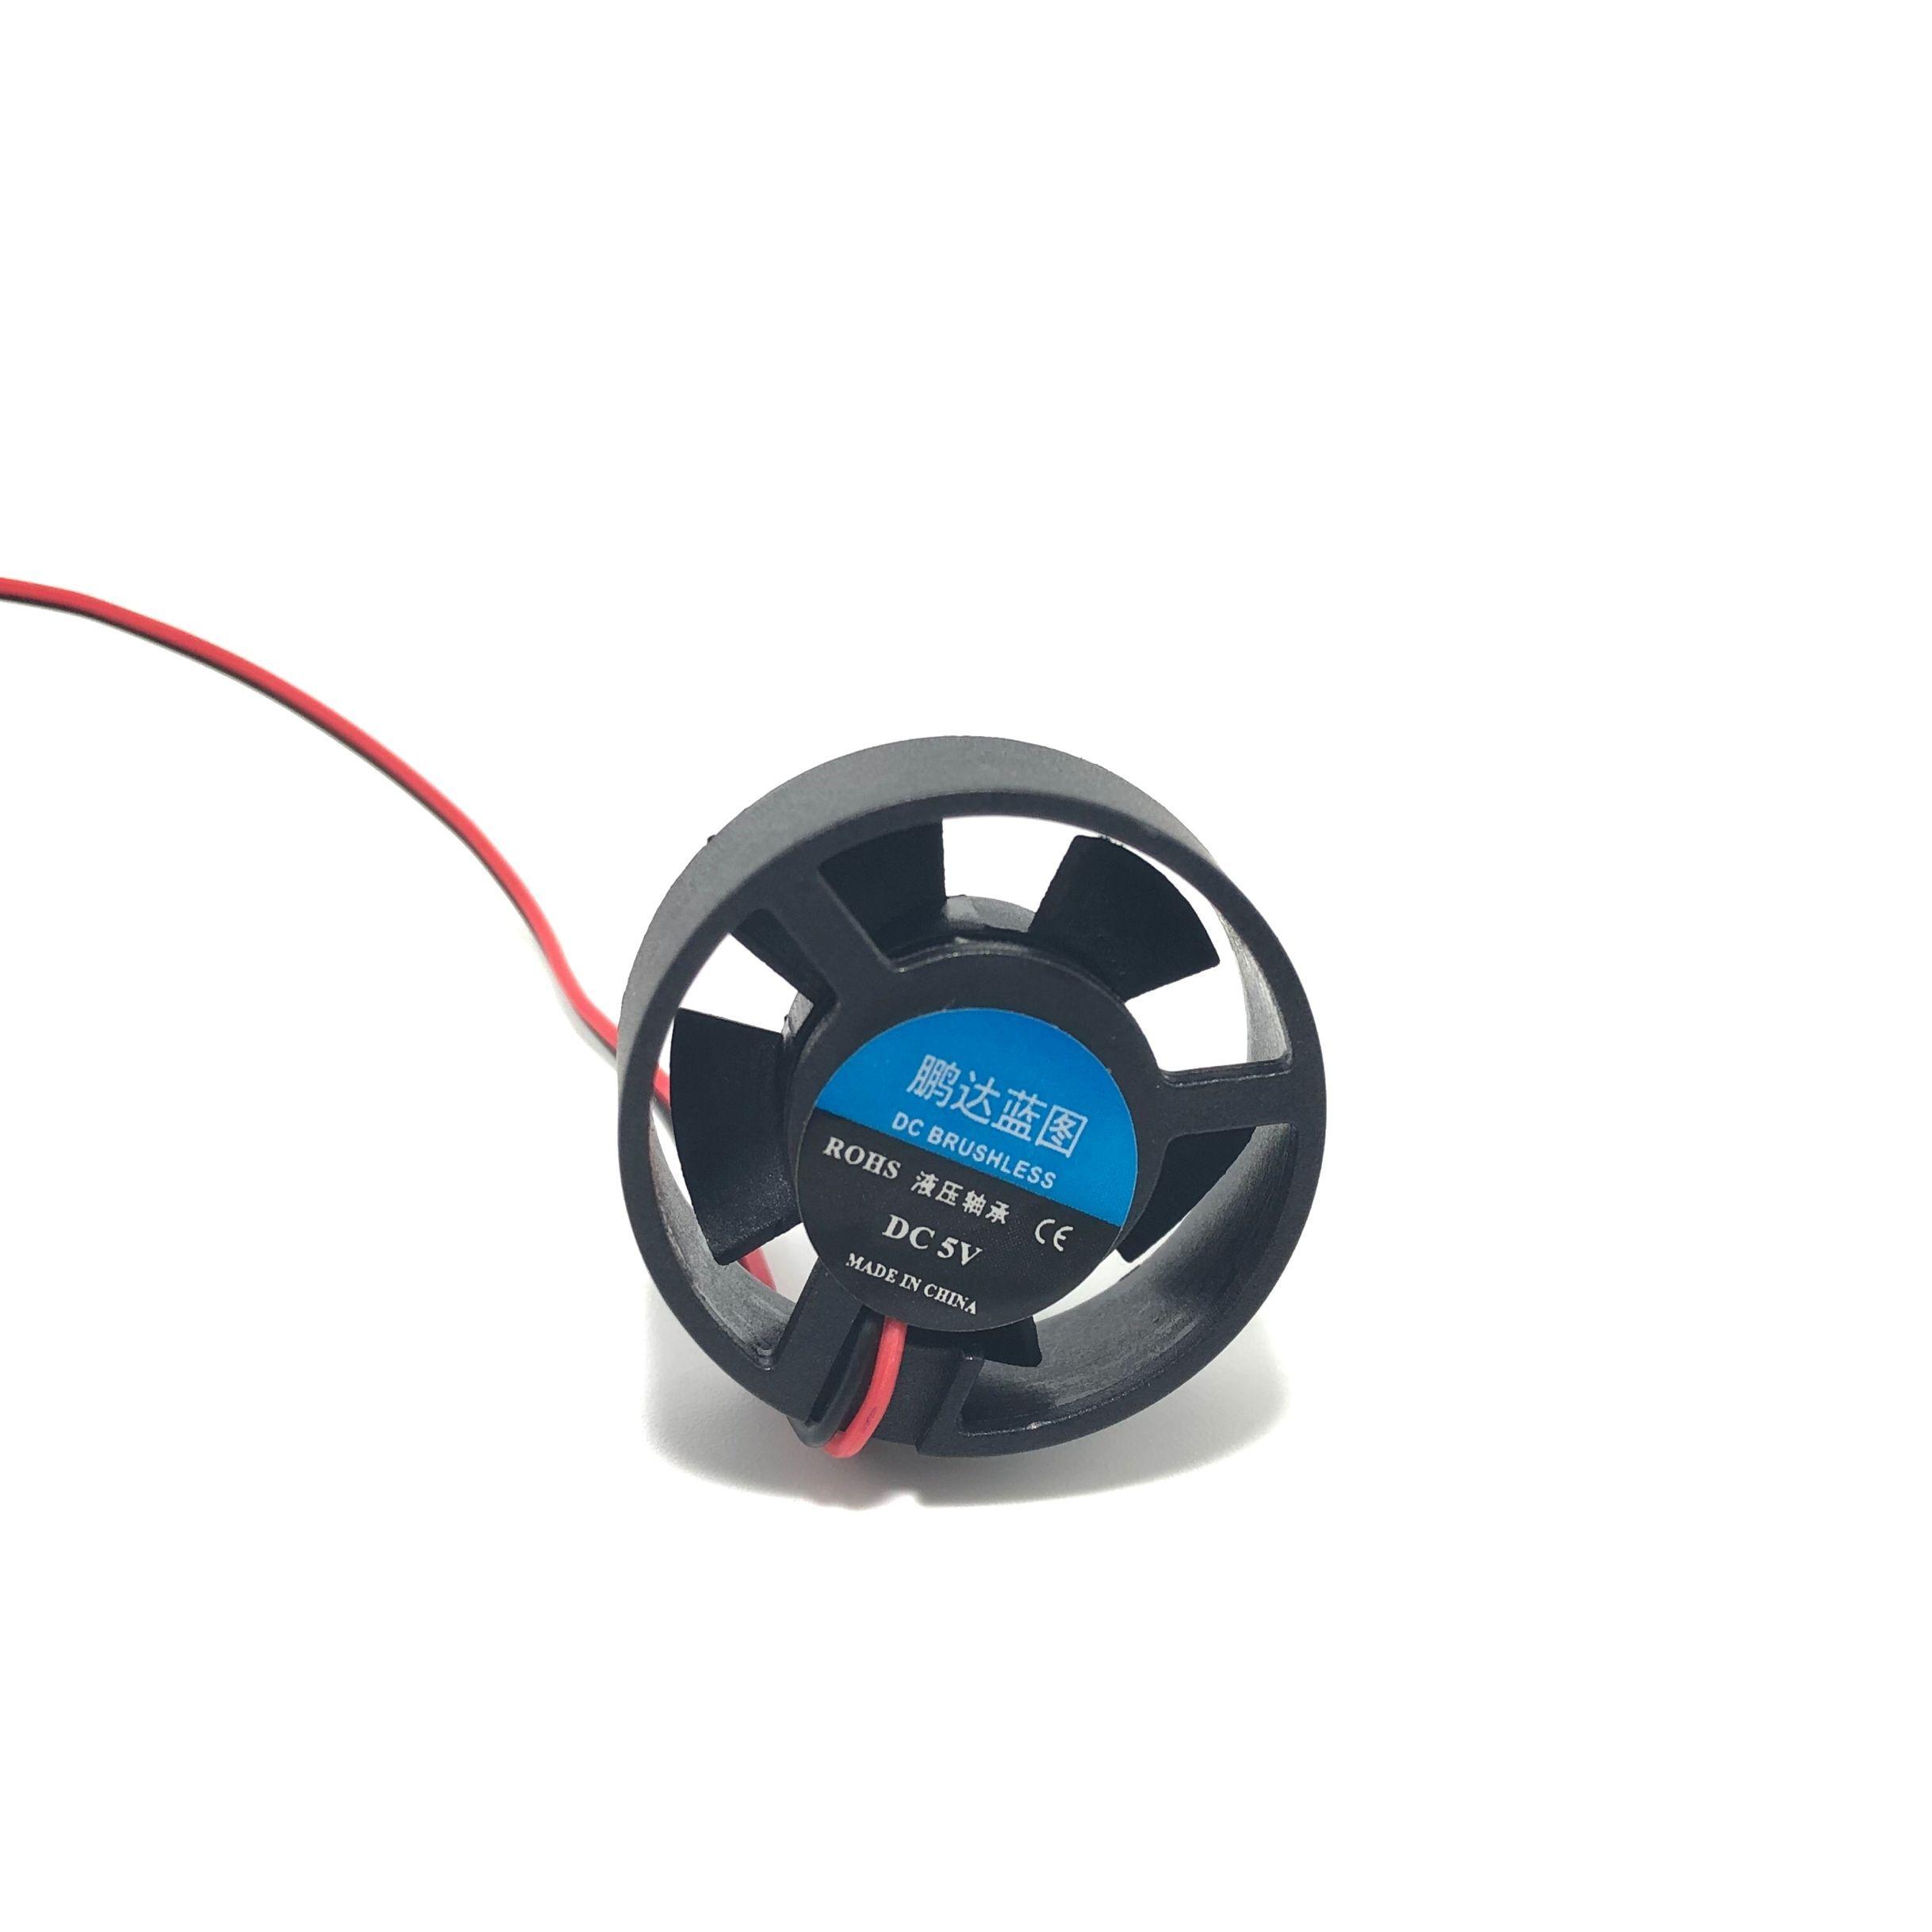 3cm CPU Fan 3010 31.5X10MM Round Exhaust Fan 24V 12V 9V 5V Fluid Bearing 30mm Mini Cooler Cooling Fan Of LED Lamps